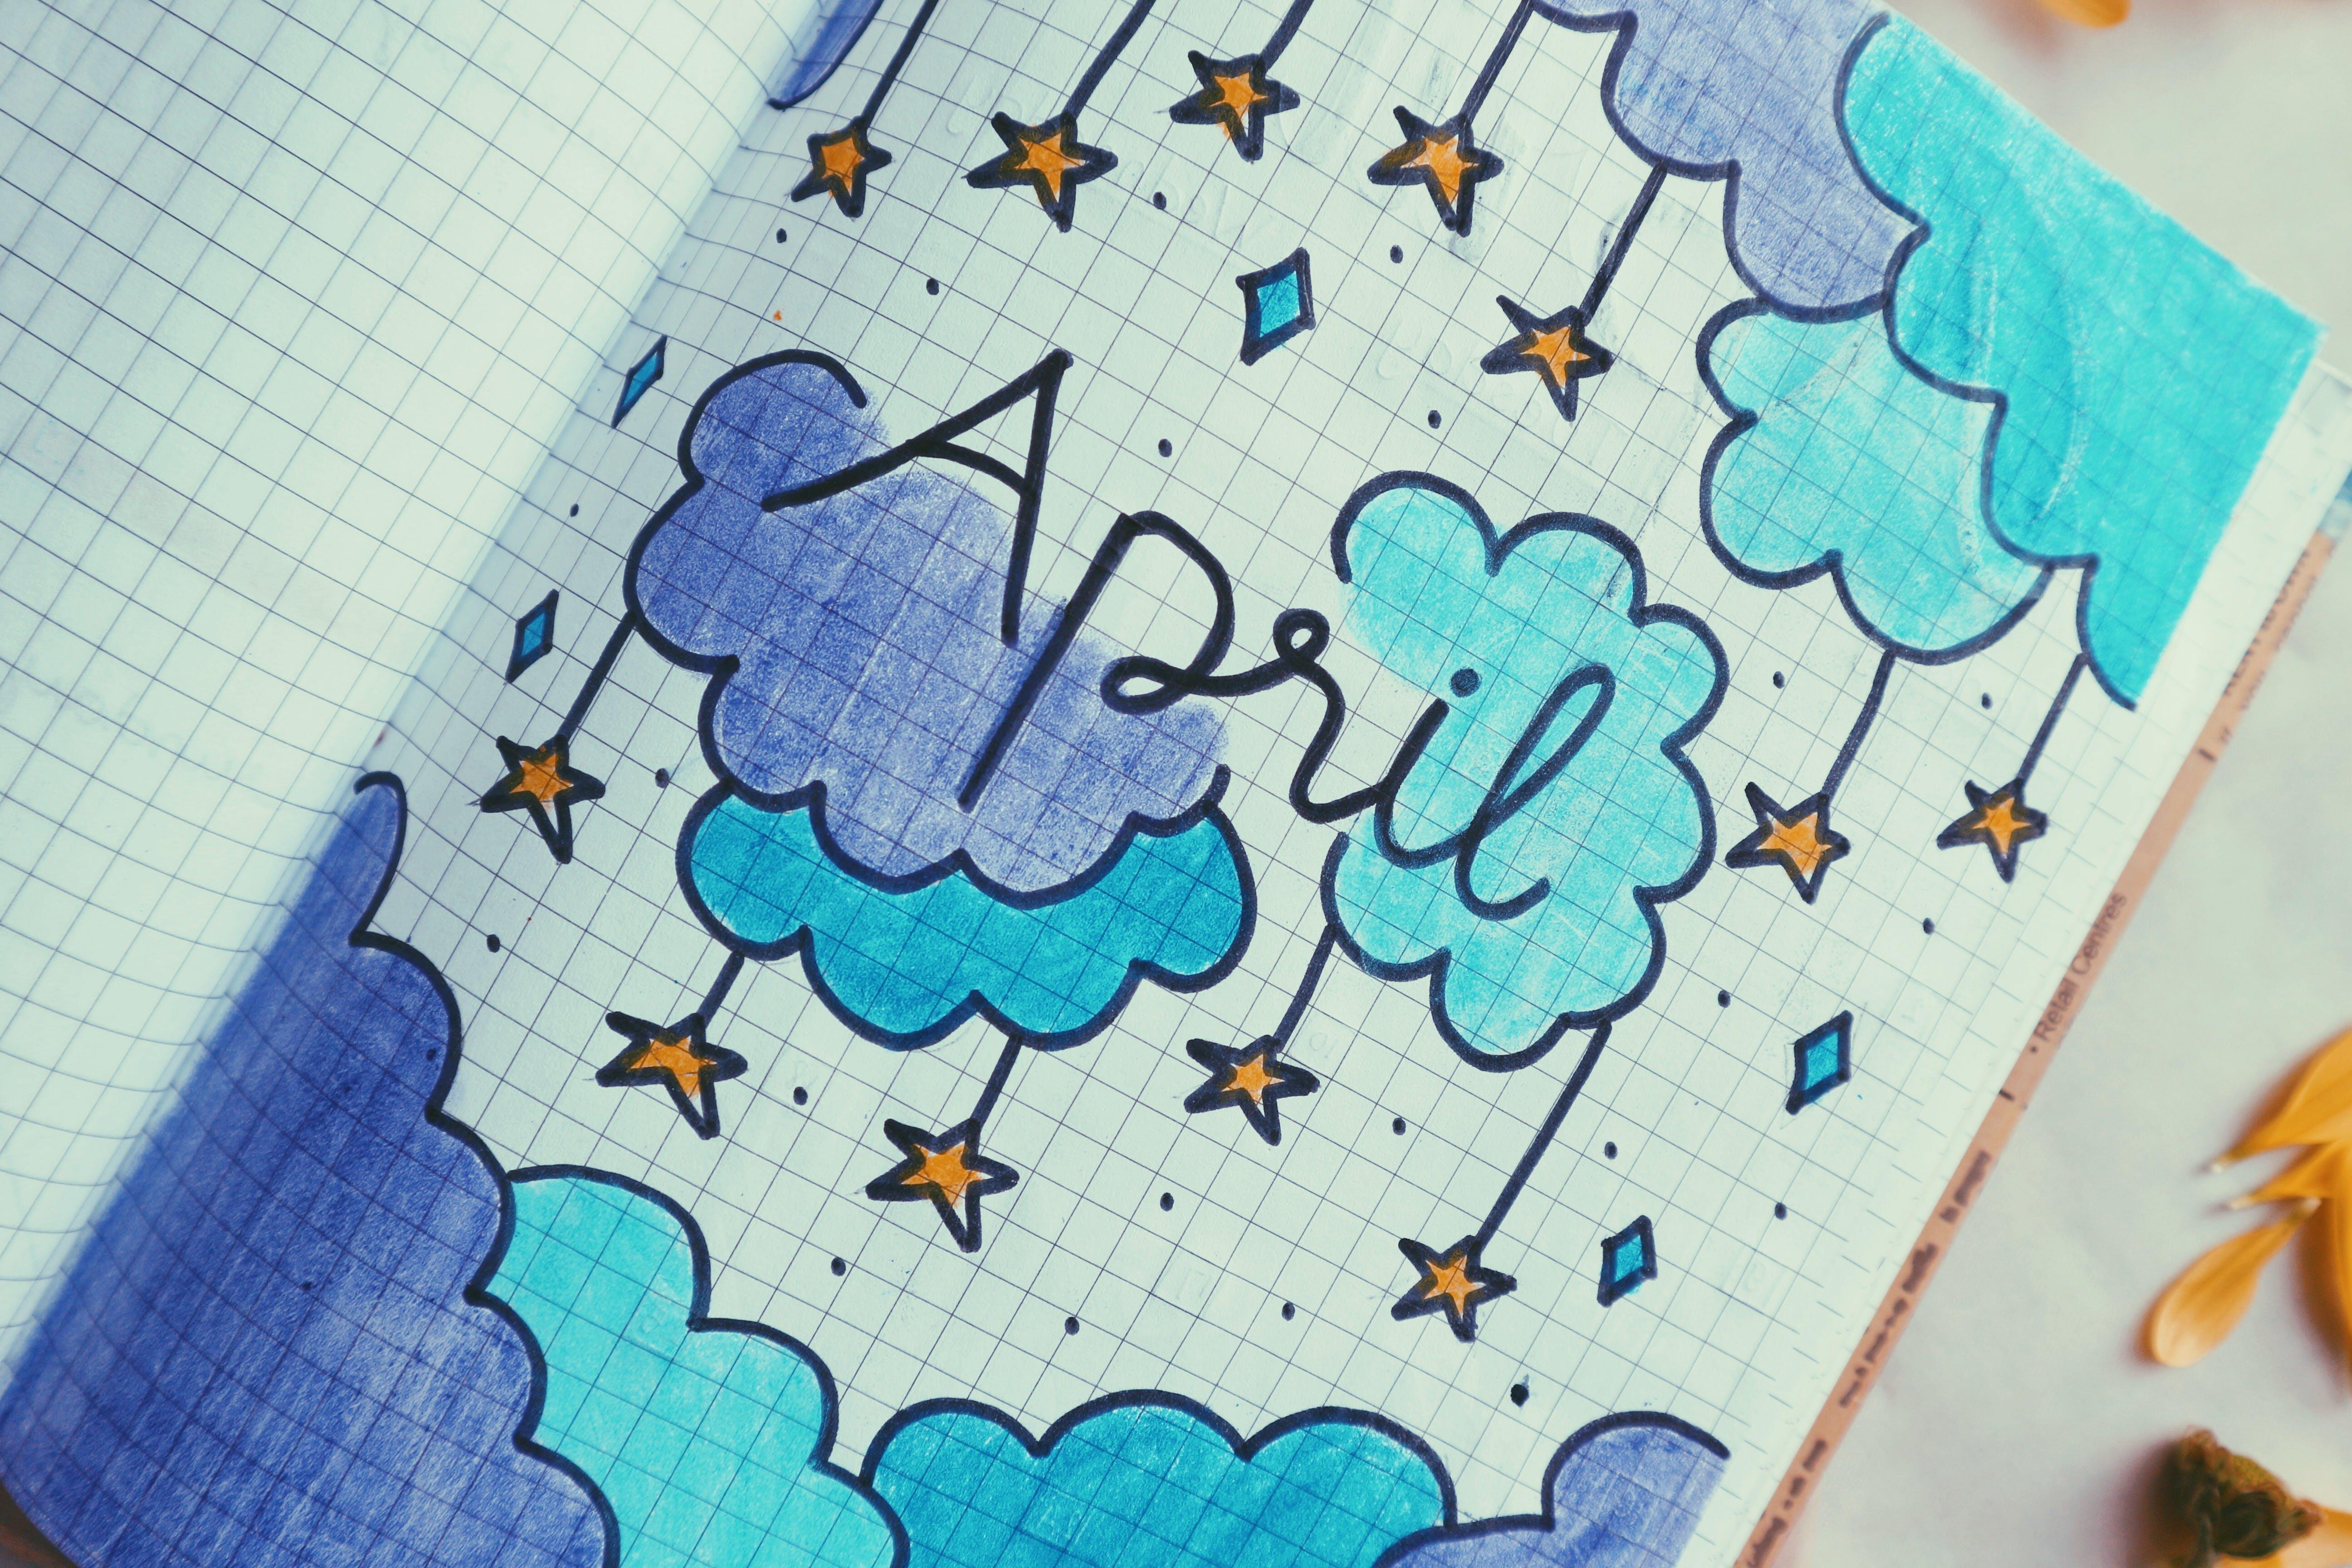 White, Blue, and Purple Stars Illustration